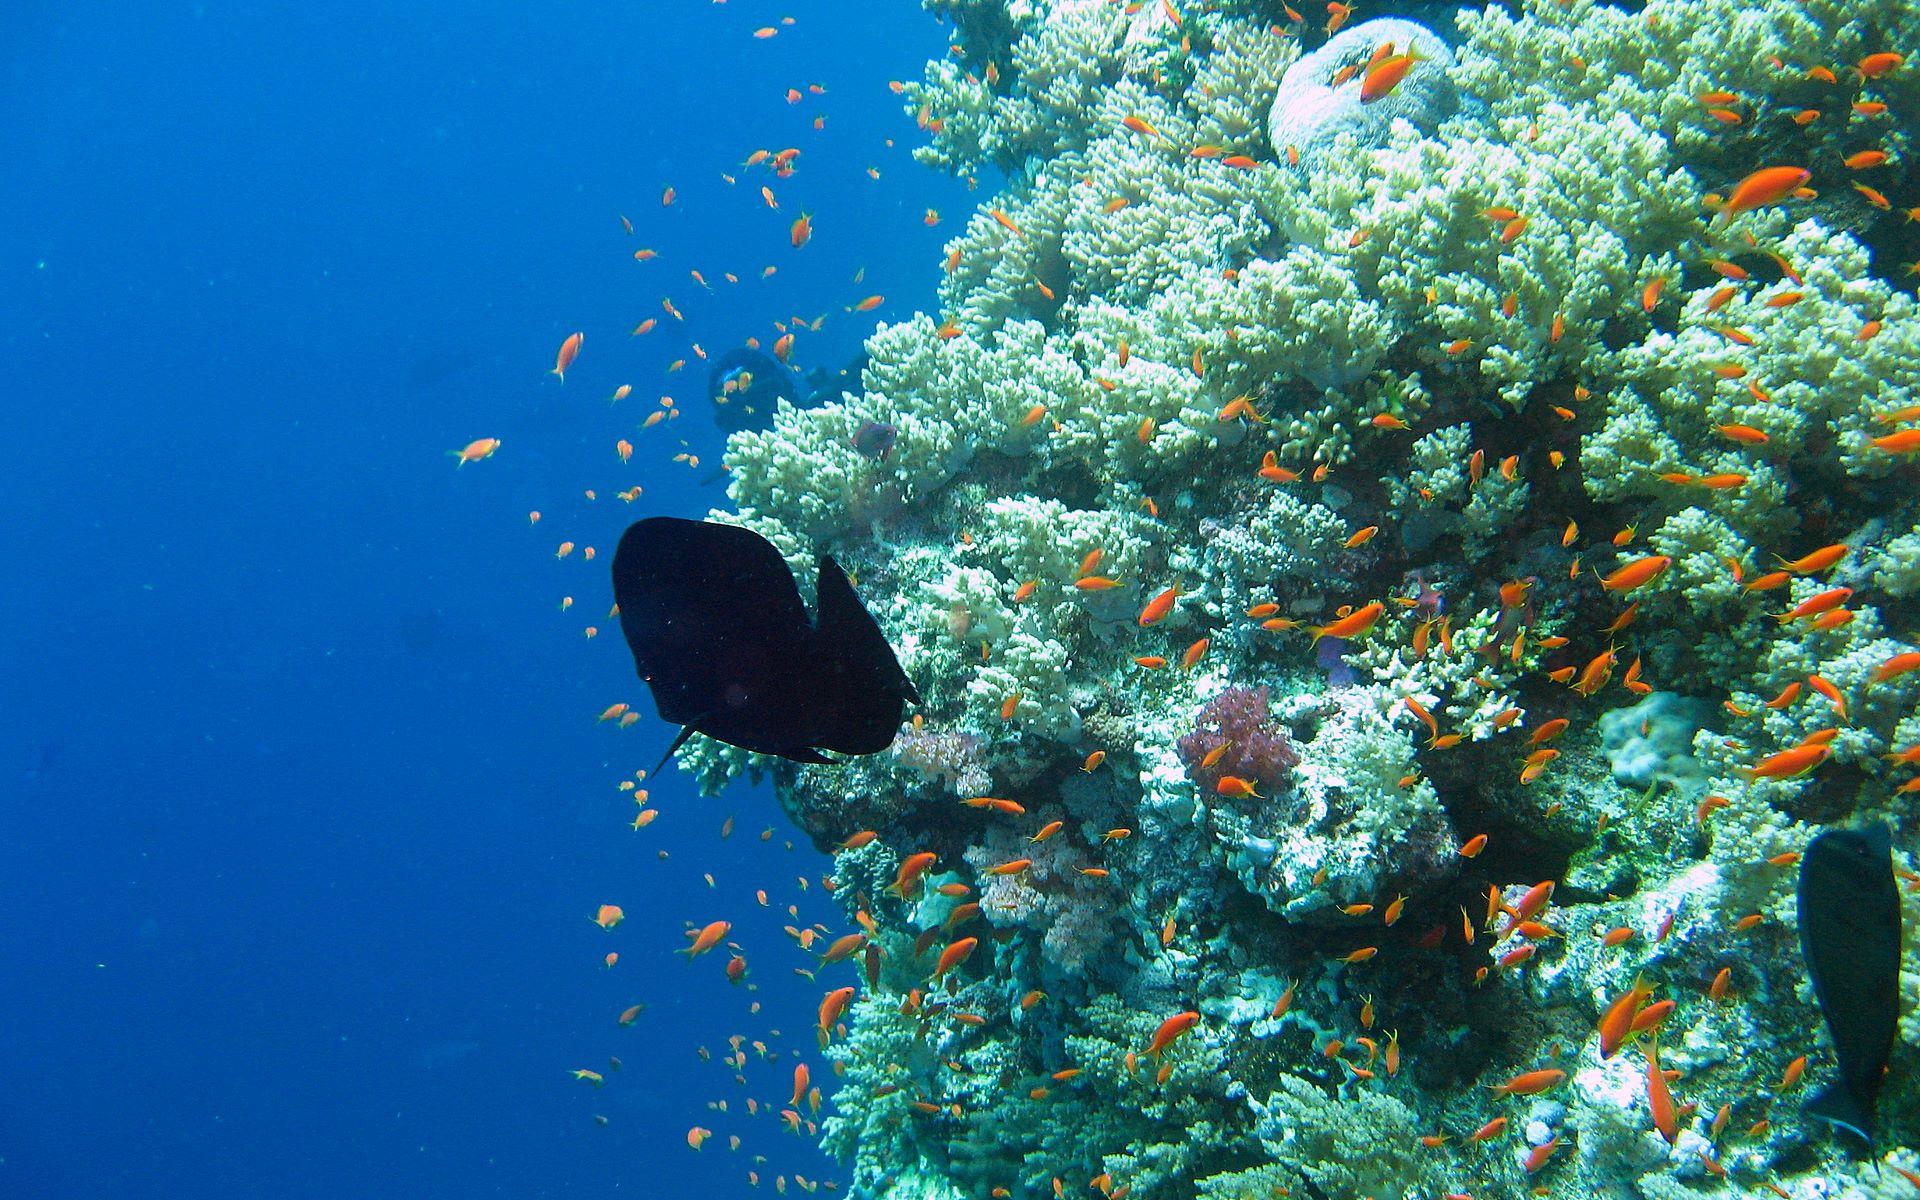 Underwater   Underwater Photography Wallpaper 32684069 1920x1200